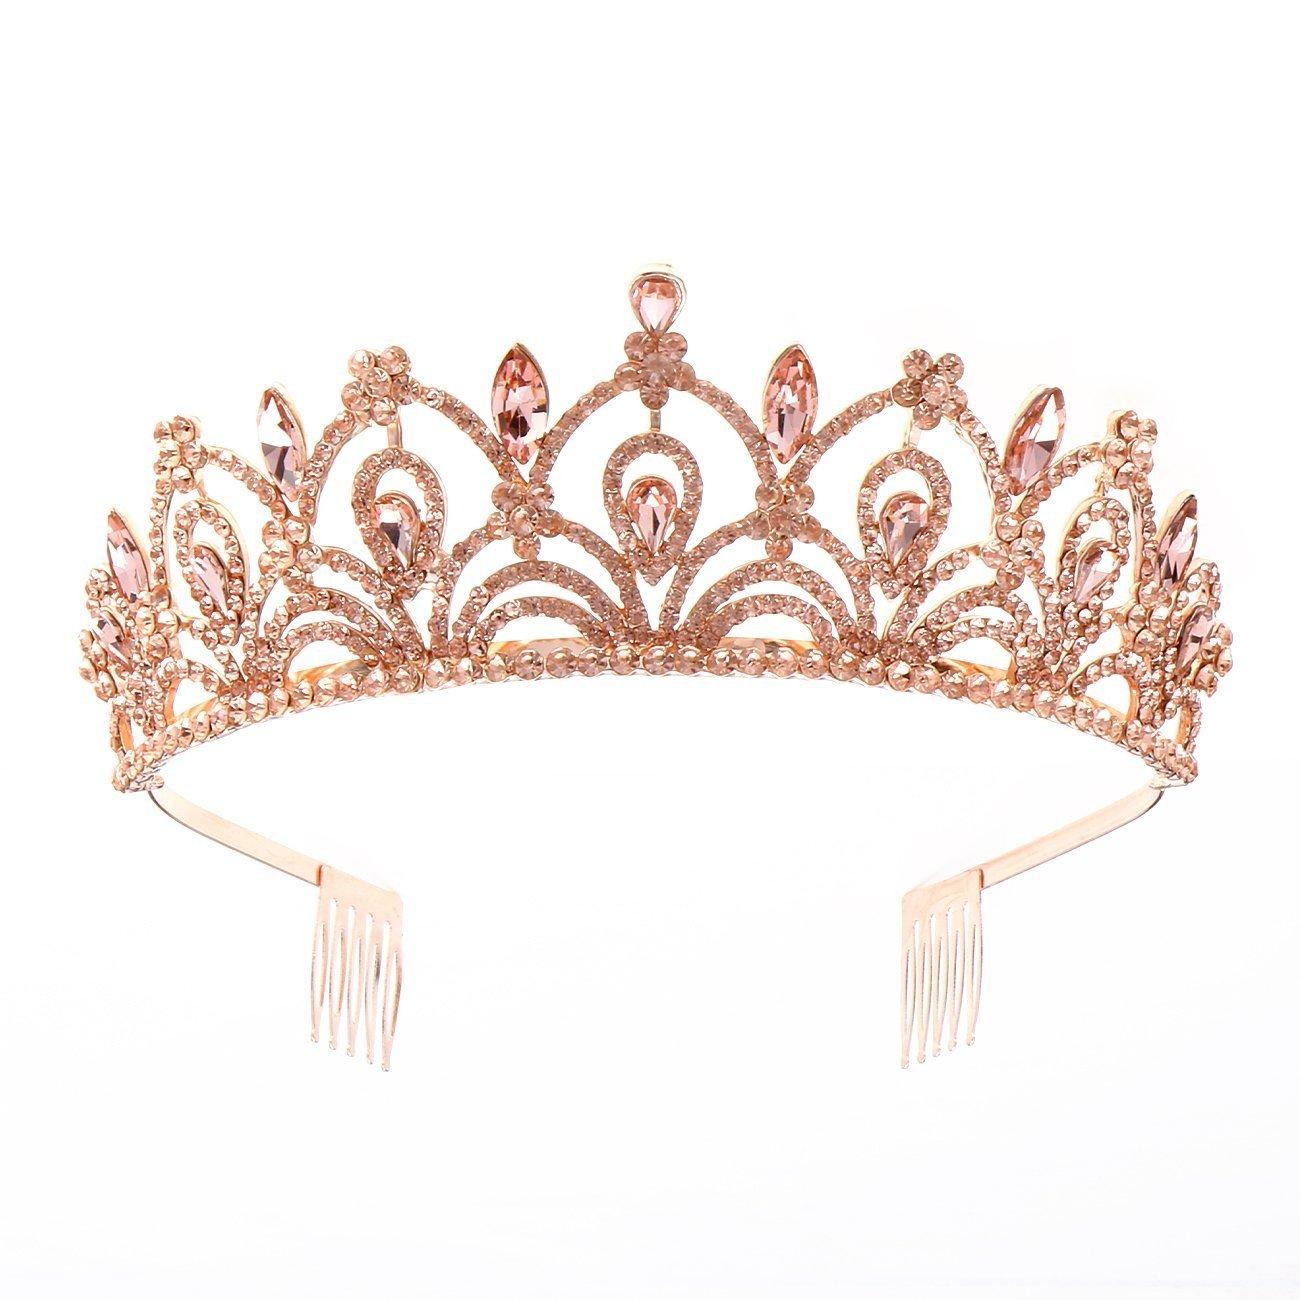 Weddingtopia Crystal Princess Pageant Rose Gold Wedding Tiara For Bride Plus Wedding Hair Pieces For Free– Rhinestone Bridal Tiara Crown with side combs Wedding Hairband Comb Pin (ROSE GOLD PEACH)